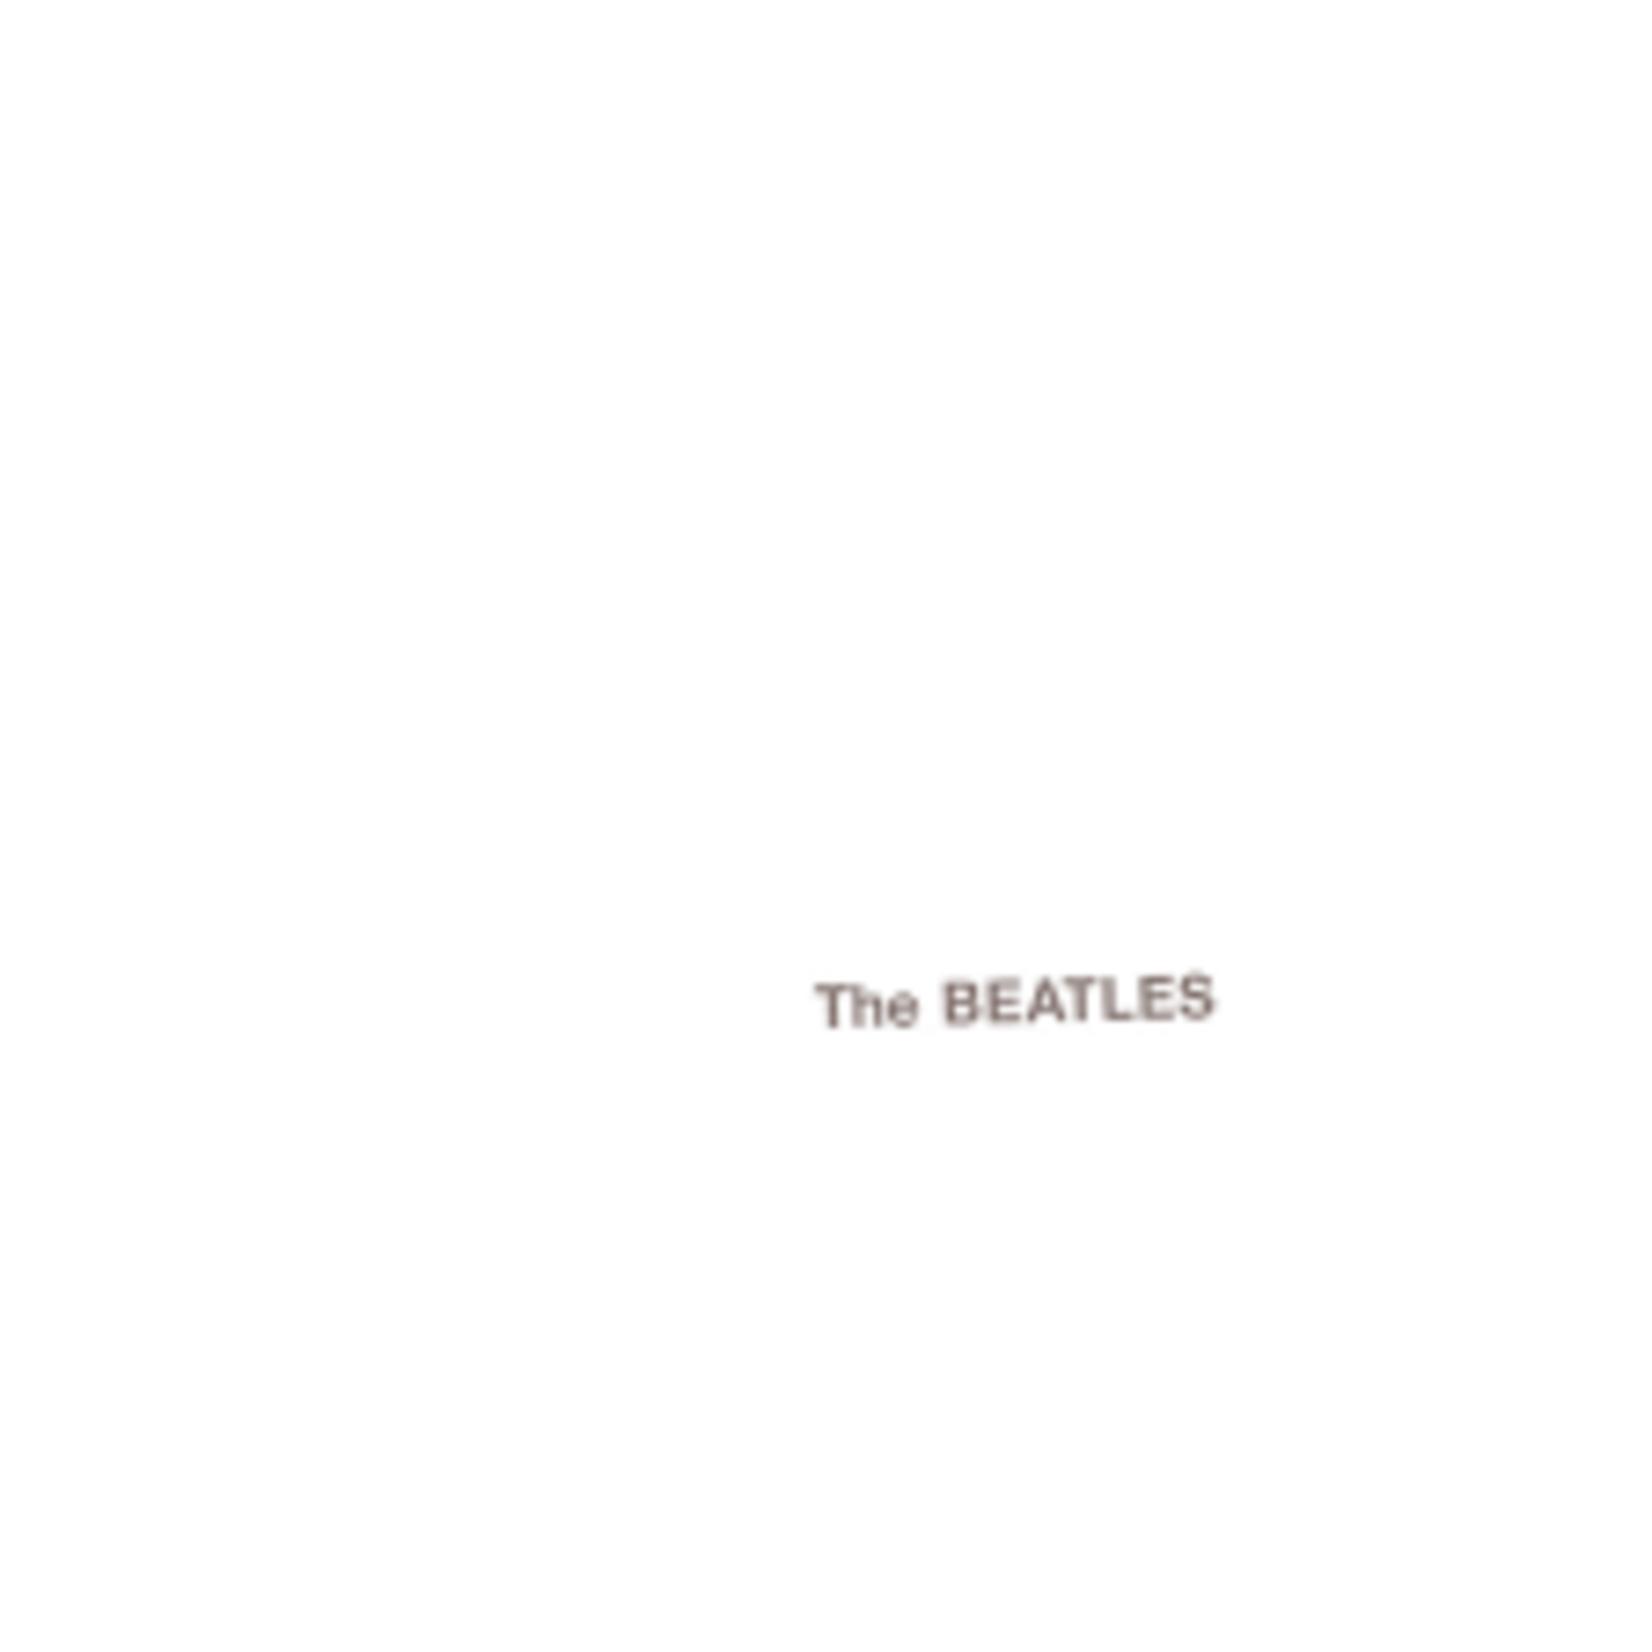 Vinyl The Beatles - White album